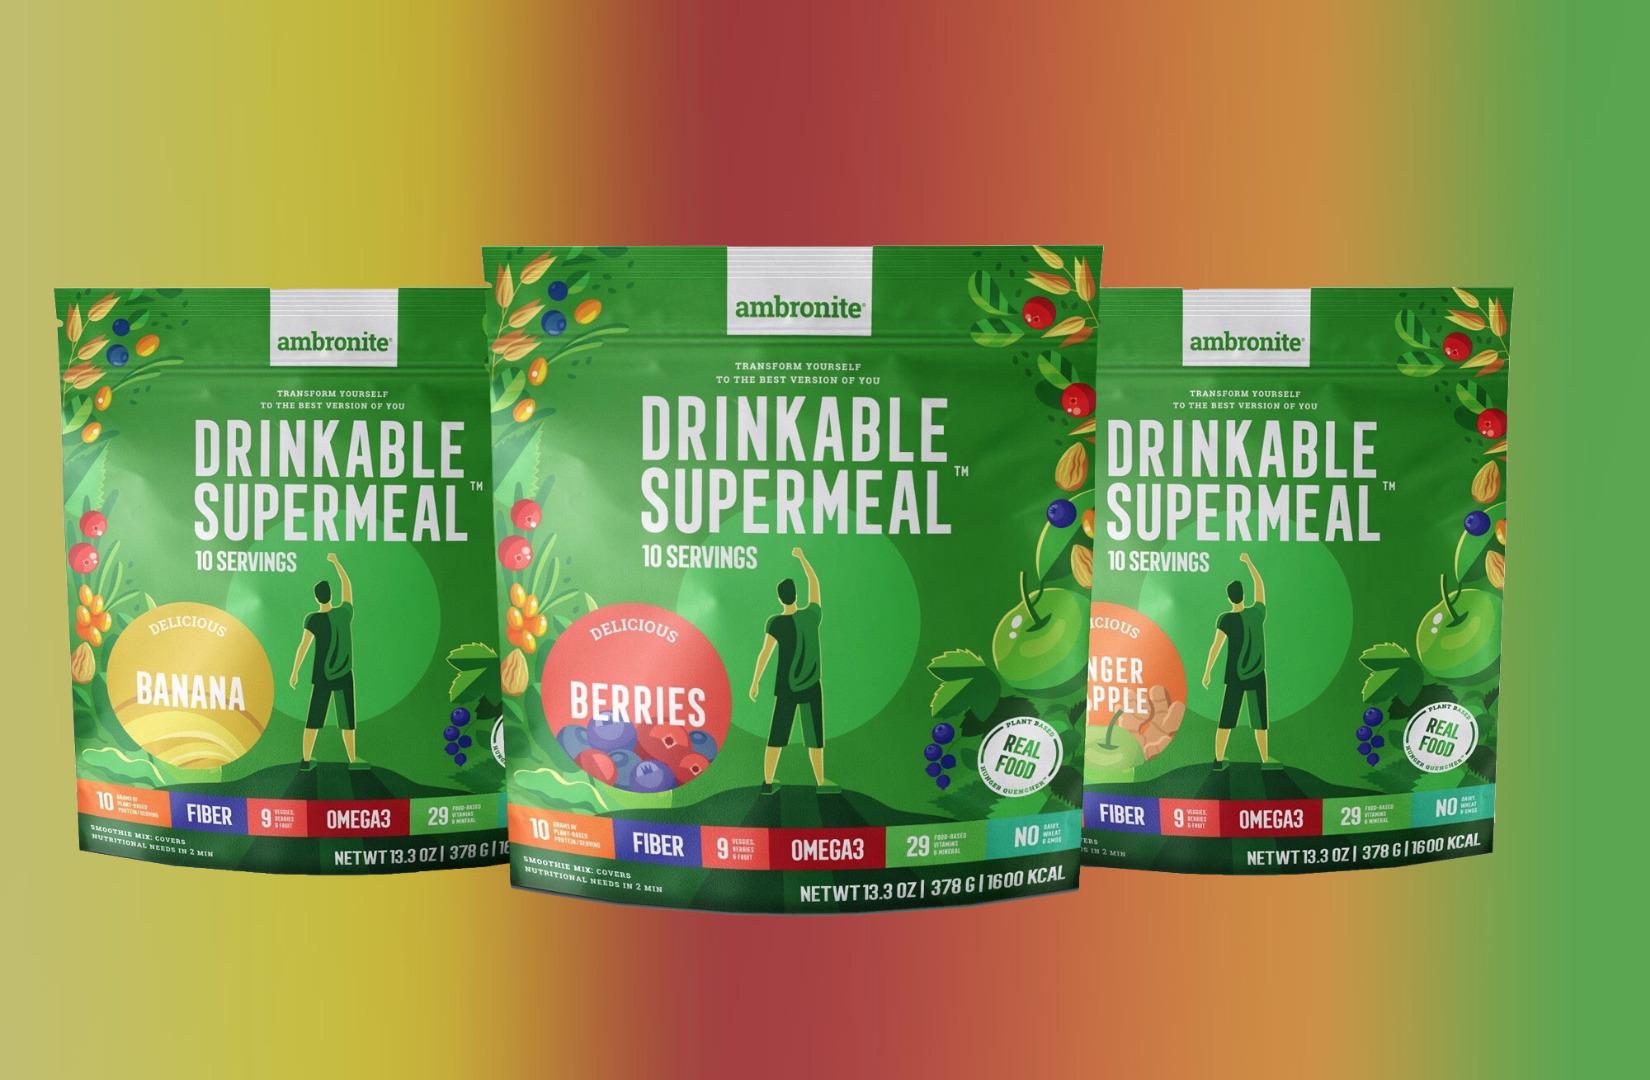 Ambronite Drinkable Supermeal 3 Flavor Bundle